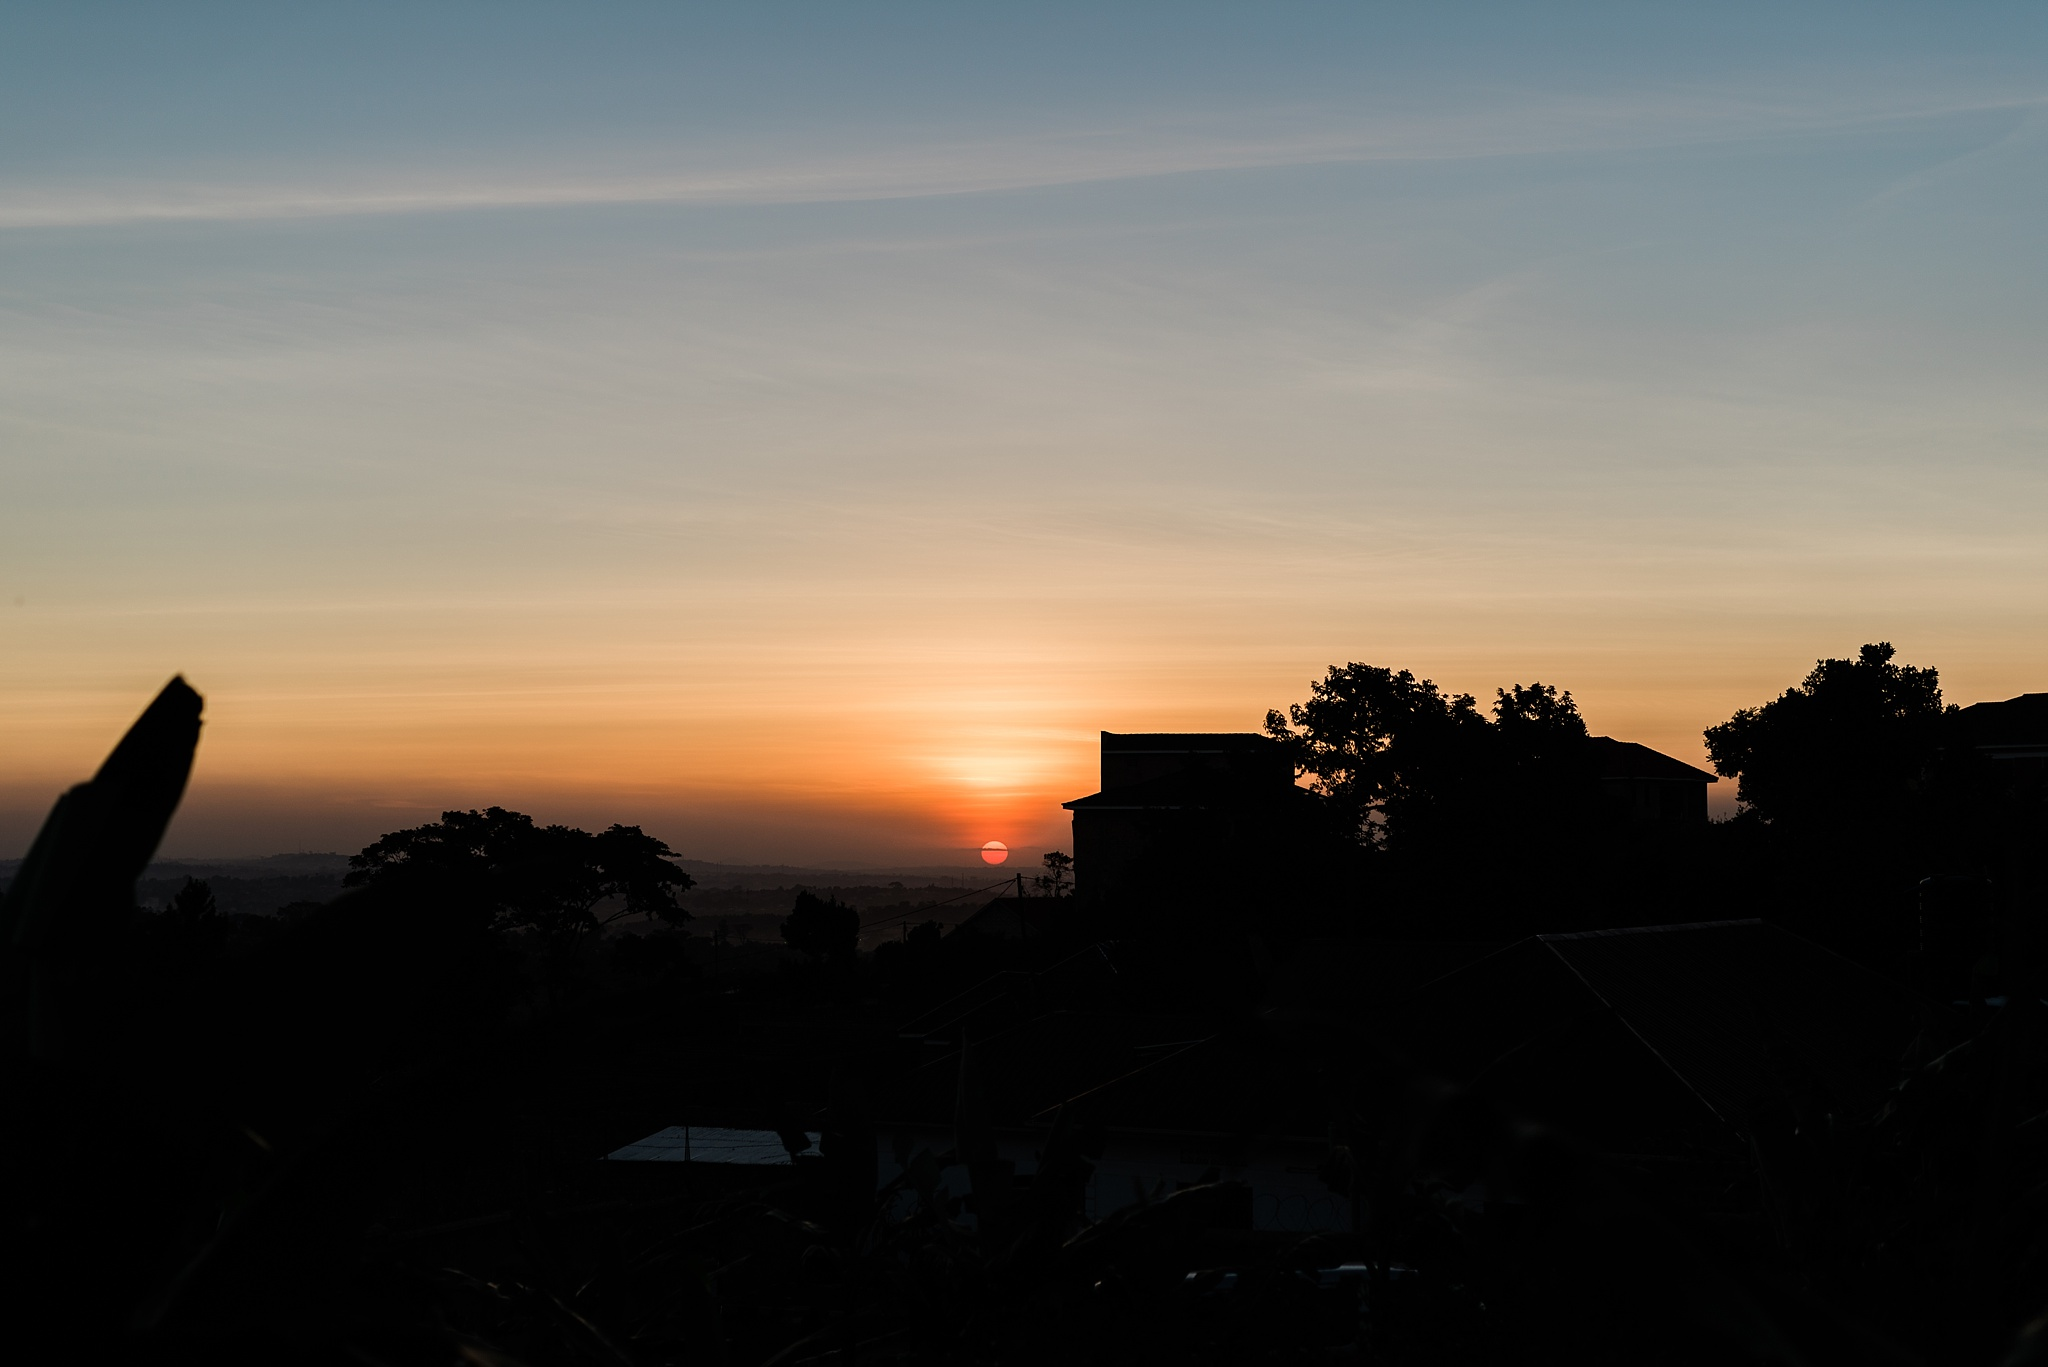 destination-photographer-uganda-graceforeducation-356.jpg